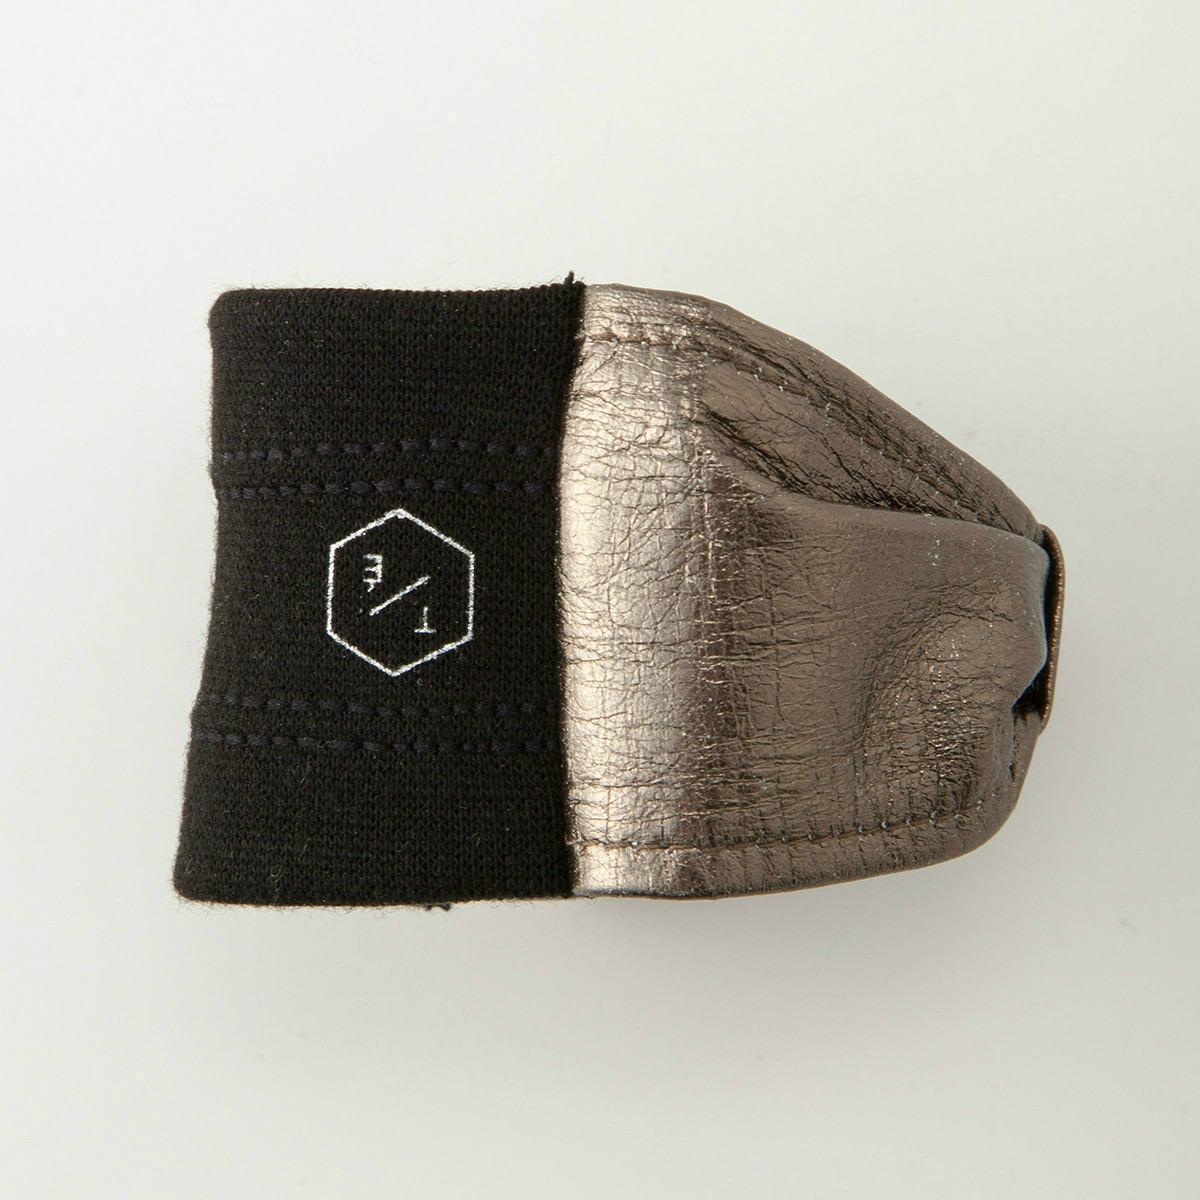 BIYUTE アームカフ 手首アクセサリー ビユテ手袋に重ねつけ コーディネイト用 リボン型 全2色